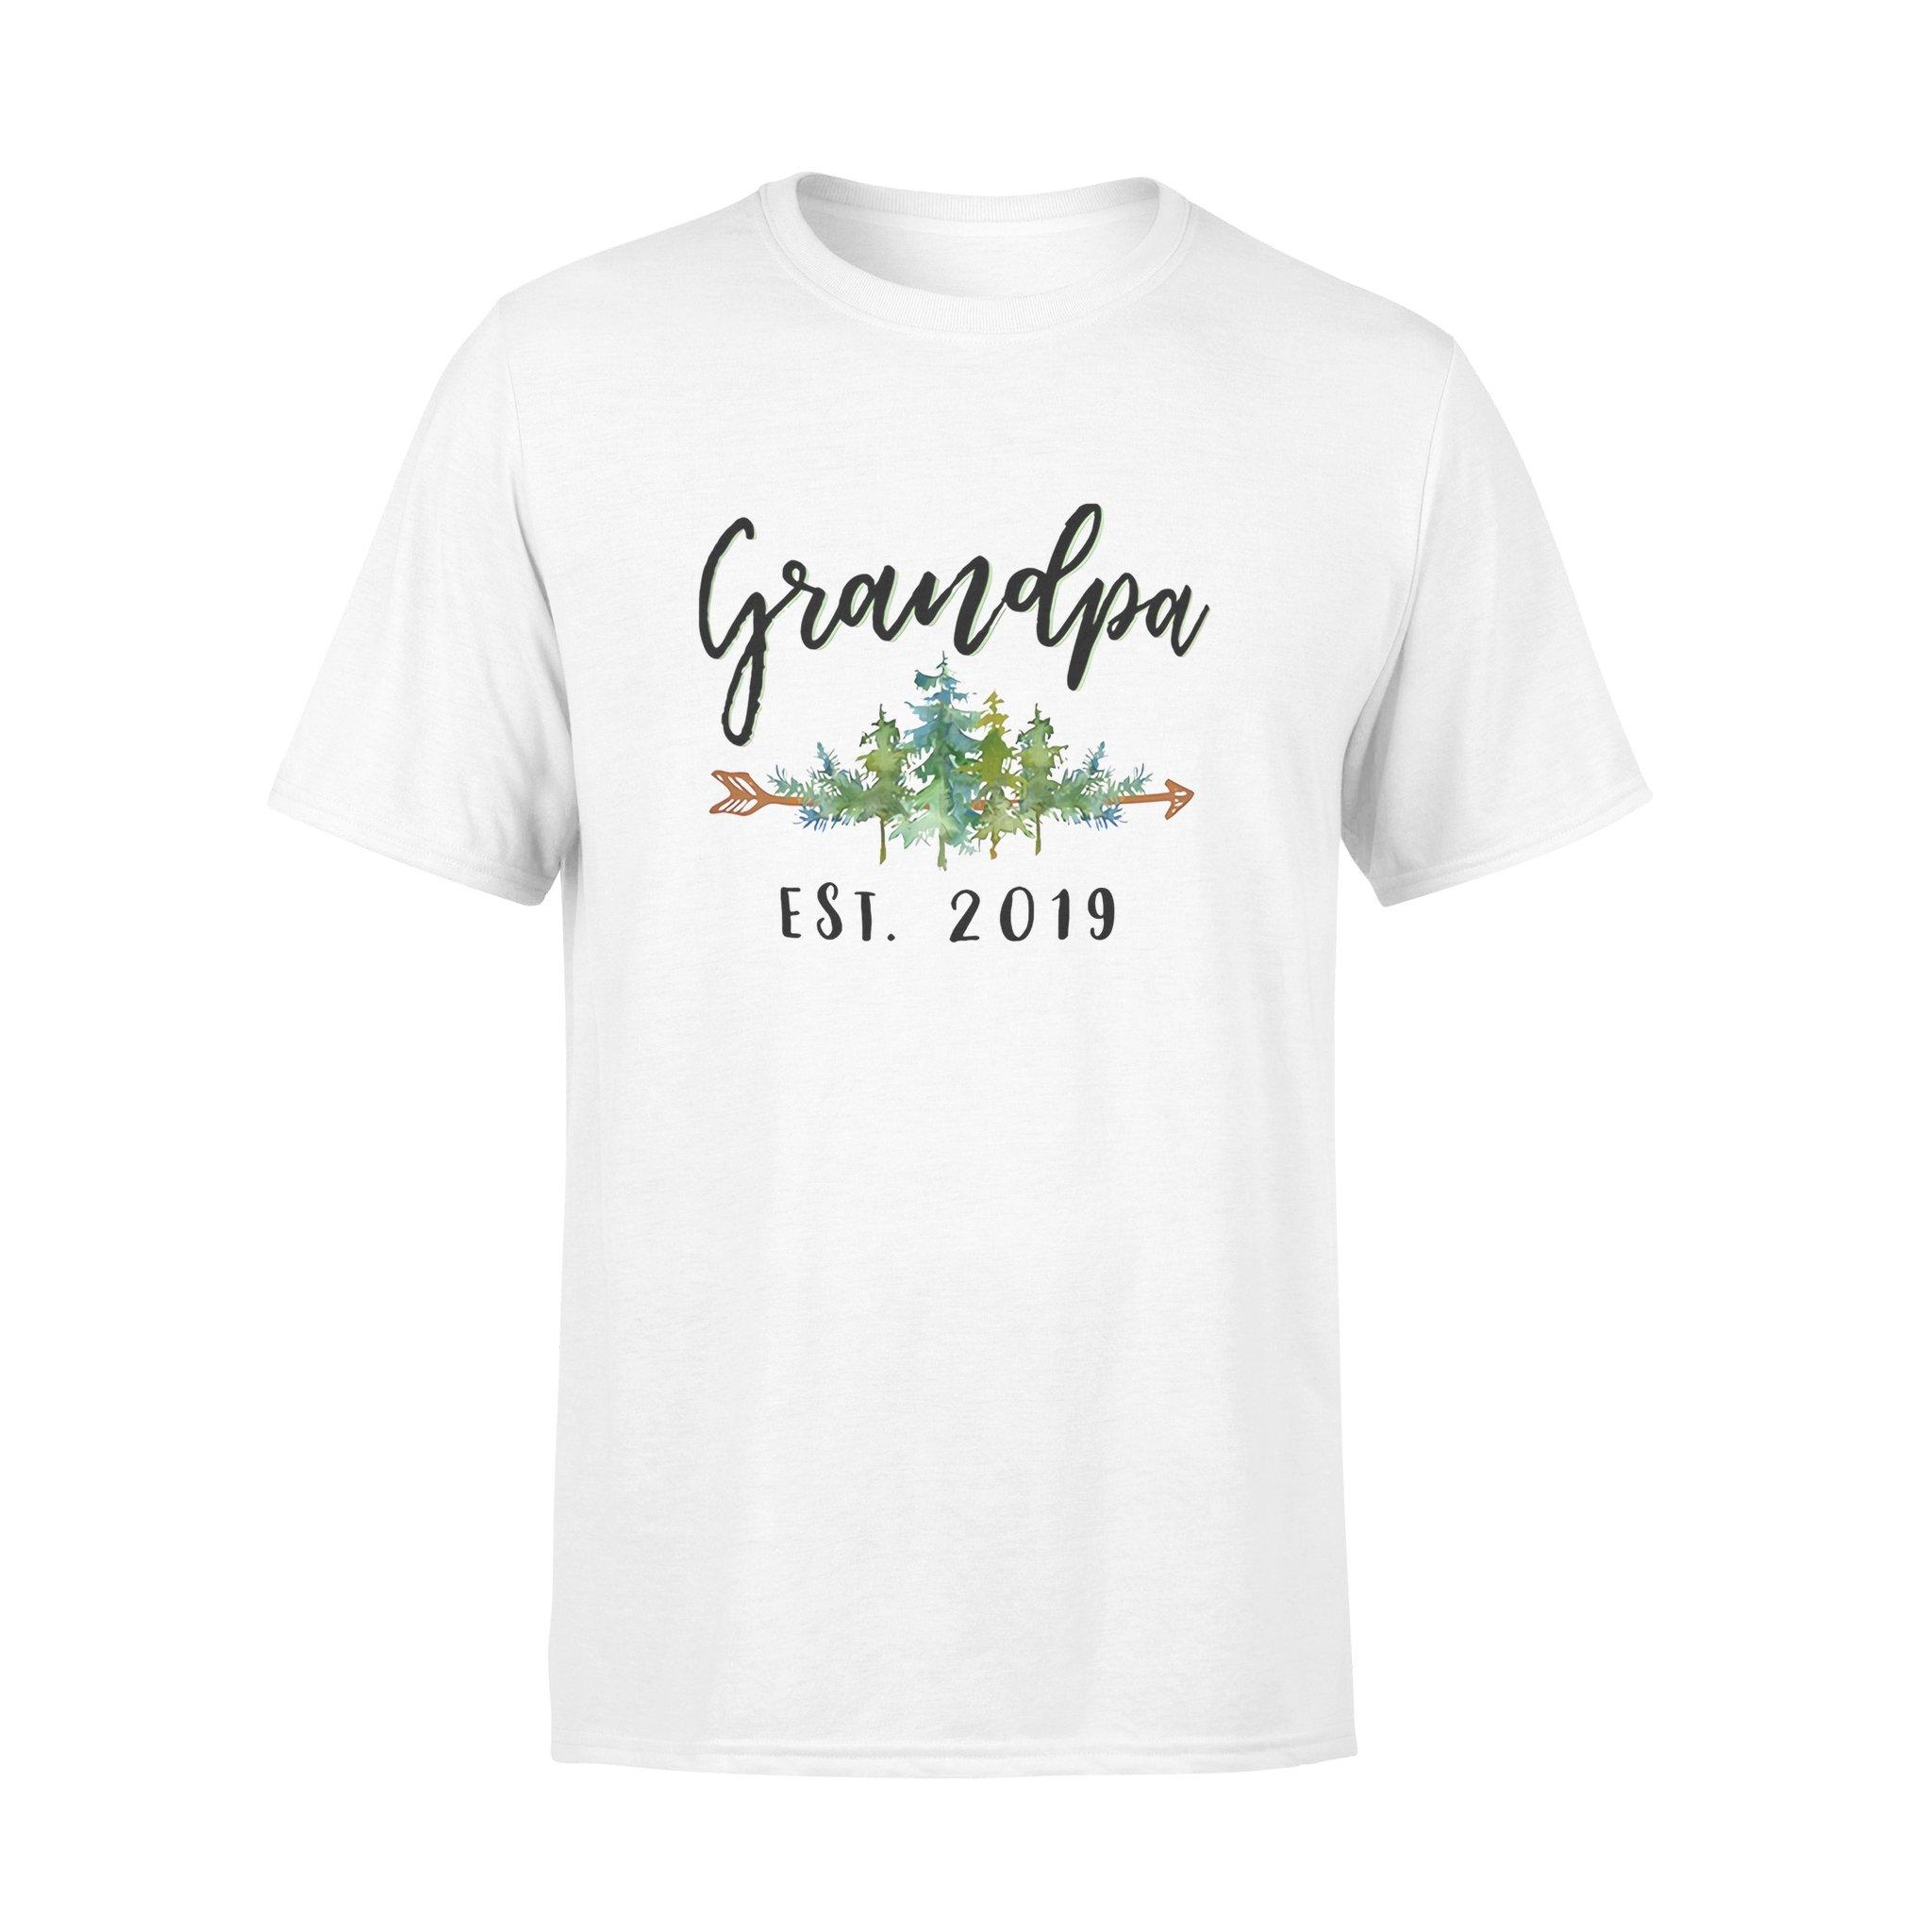 grandpa T shirt - Gifts for grandpa